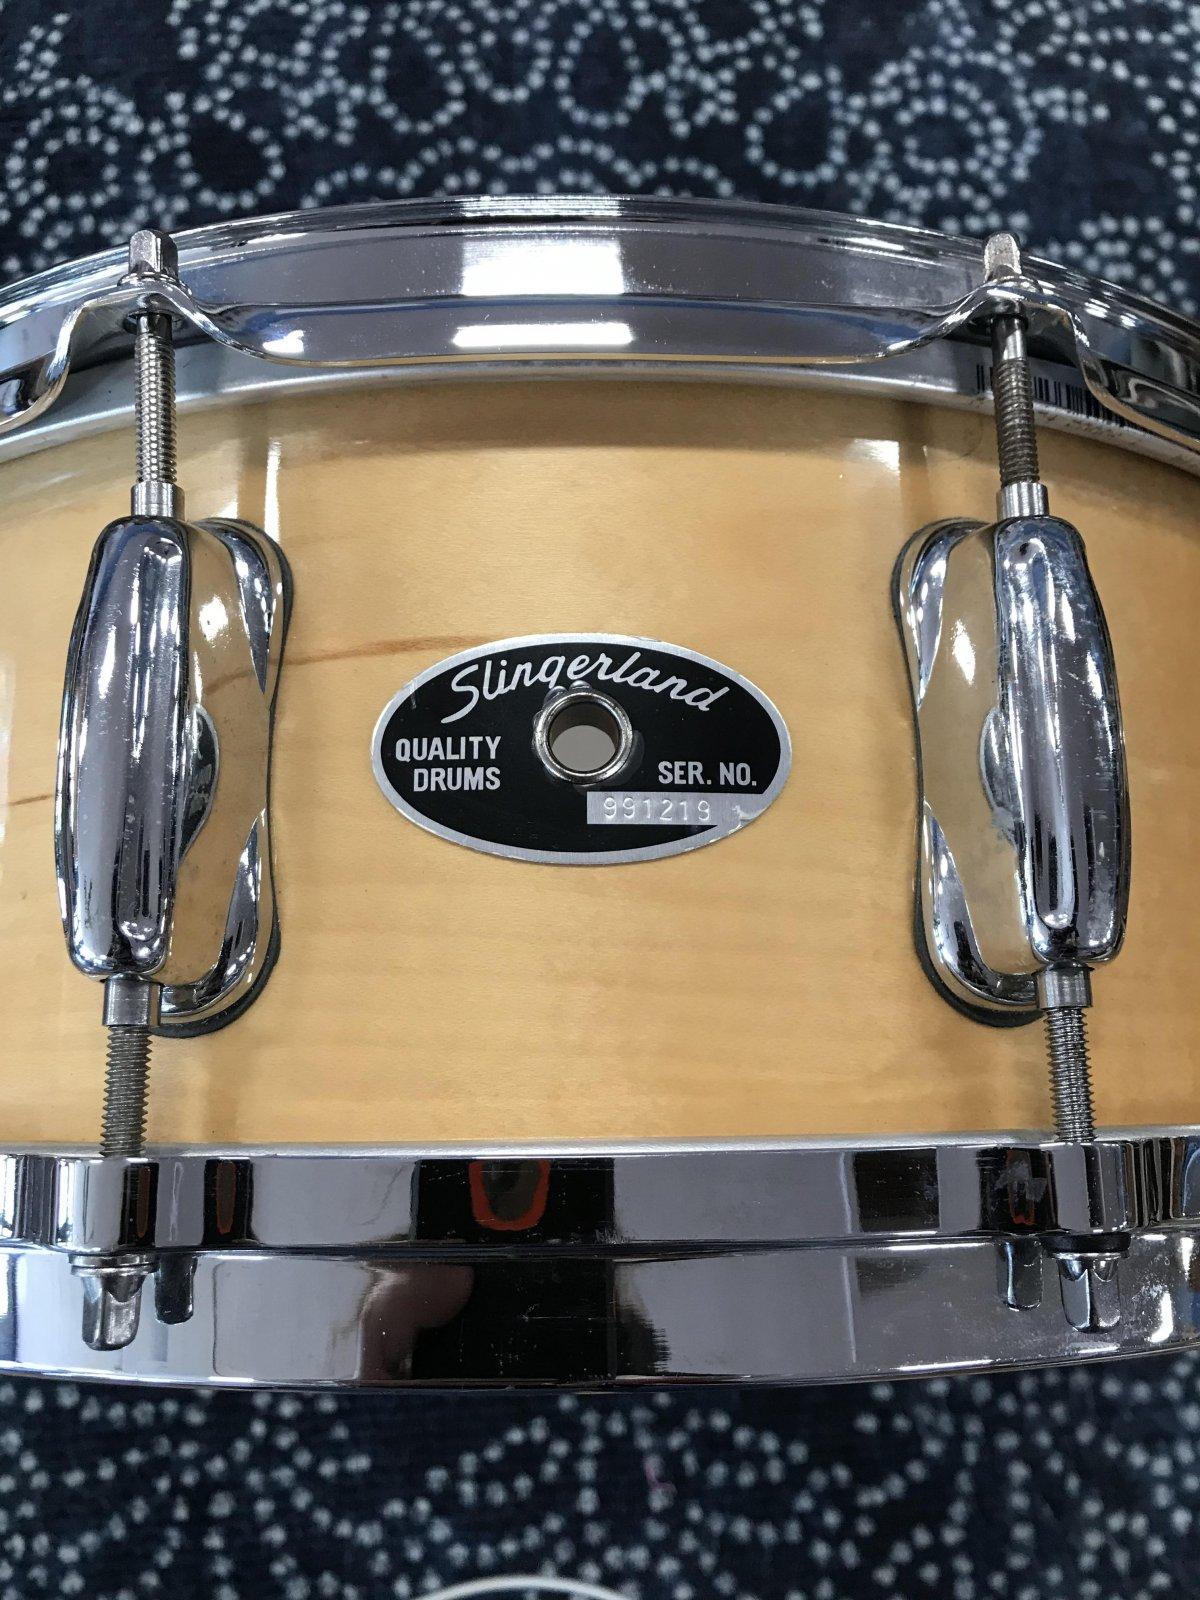 Used Slingerland 2ply Maple Snare